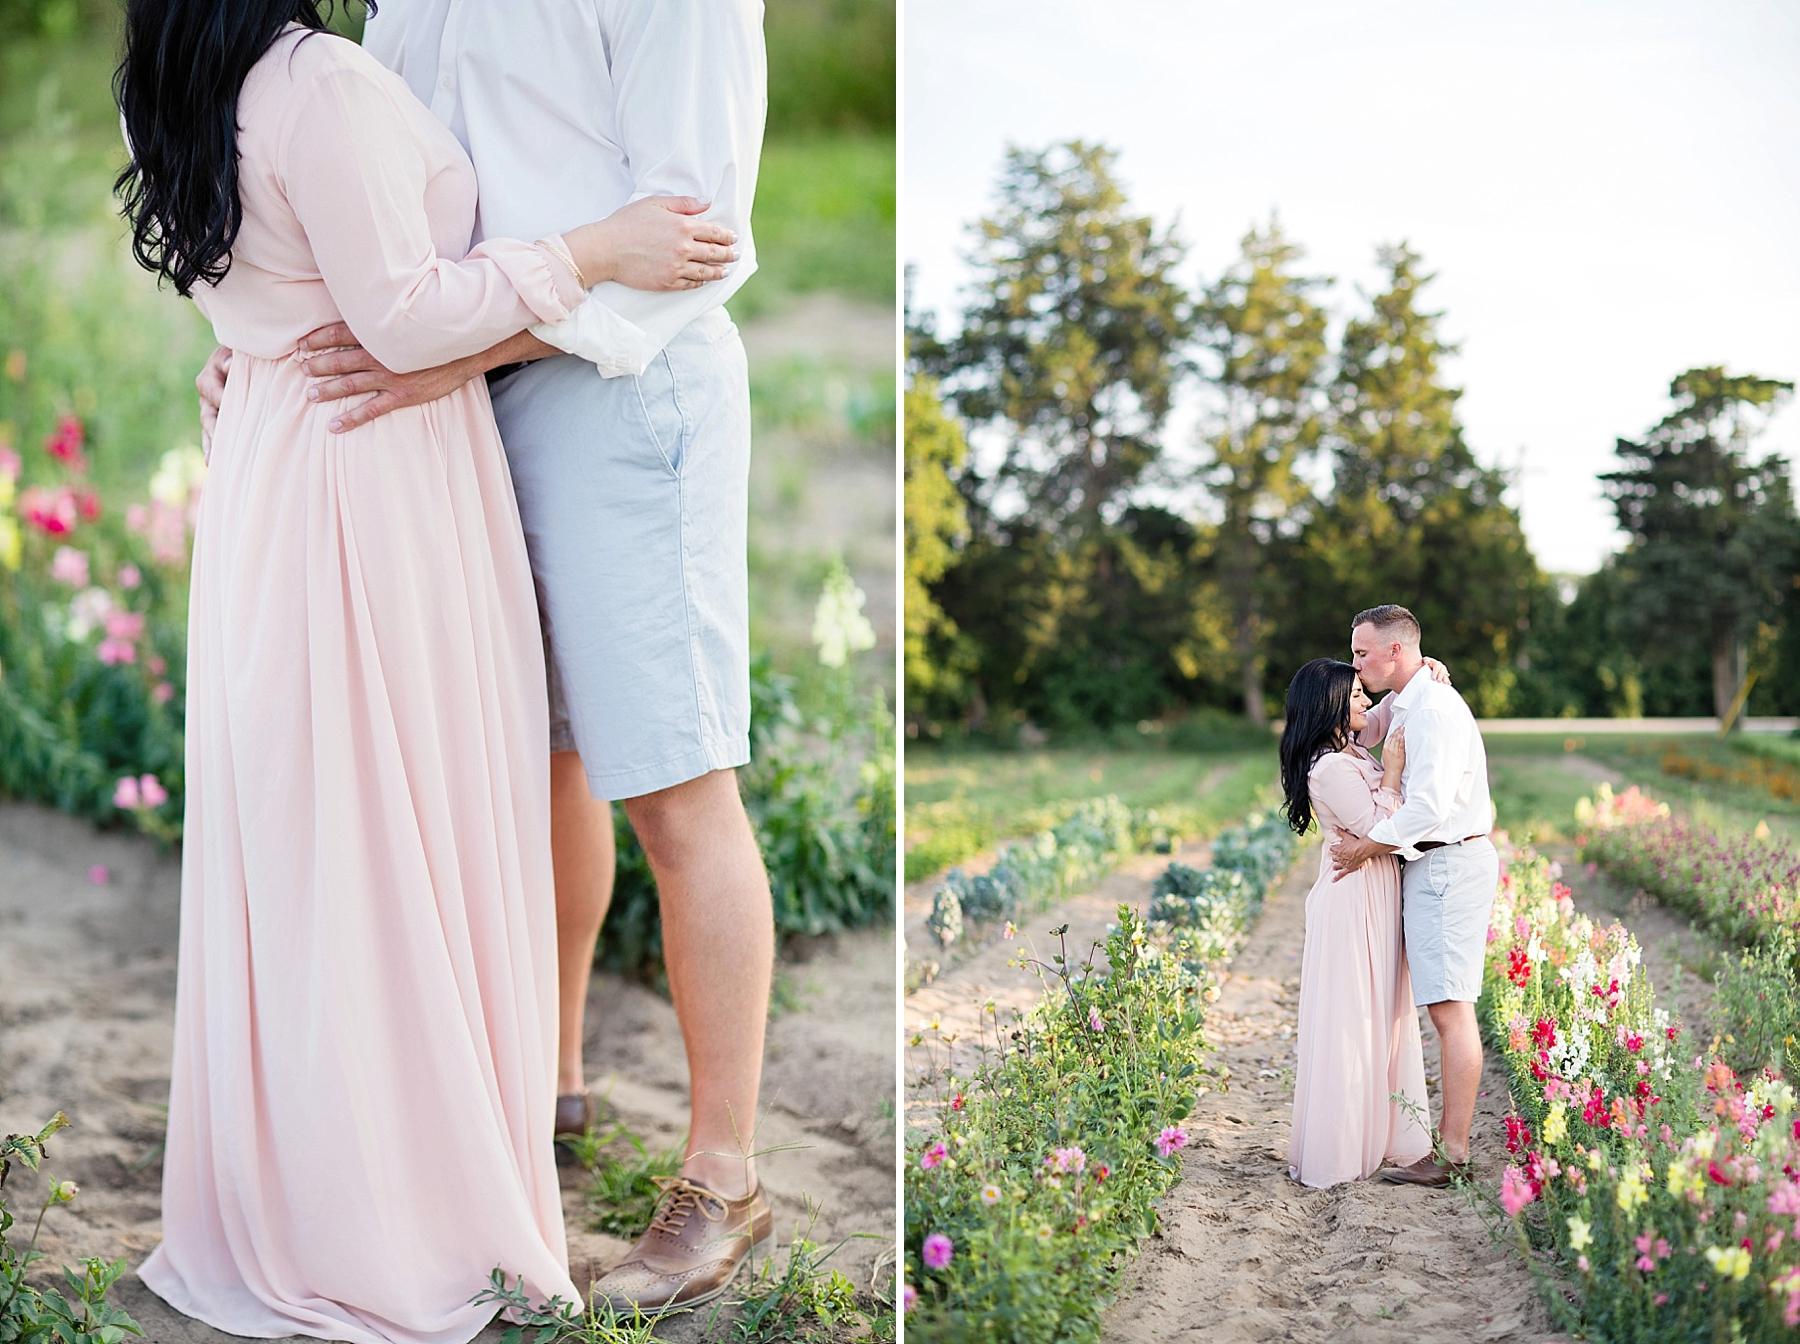 windsor-wedding-engagement-photographer-eryn-shea-photography-field-of-flowers_0014.jpg